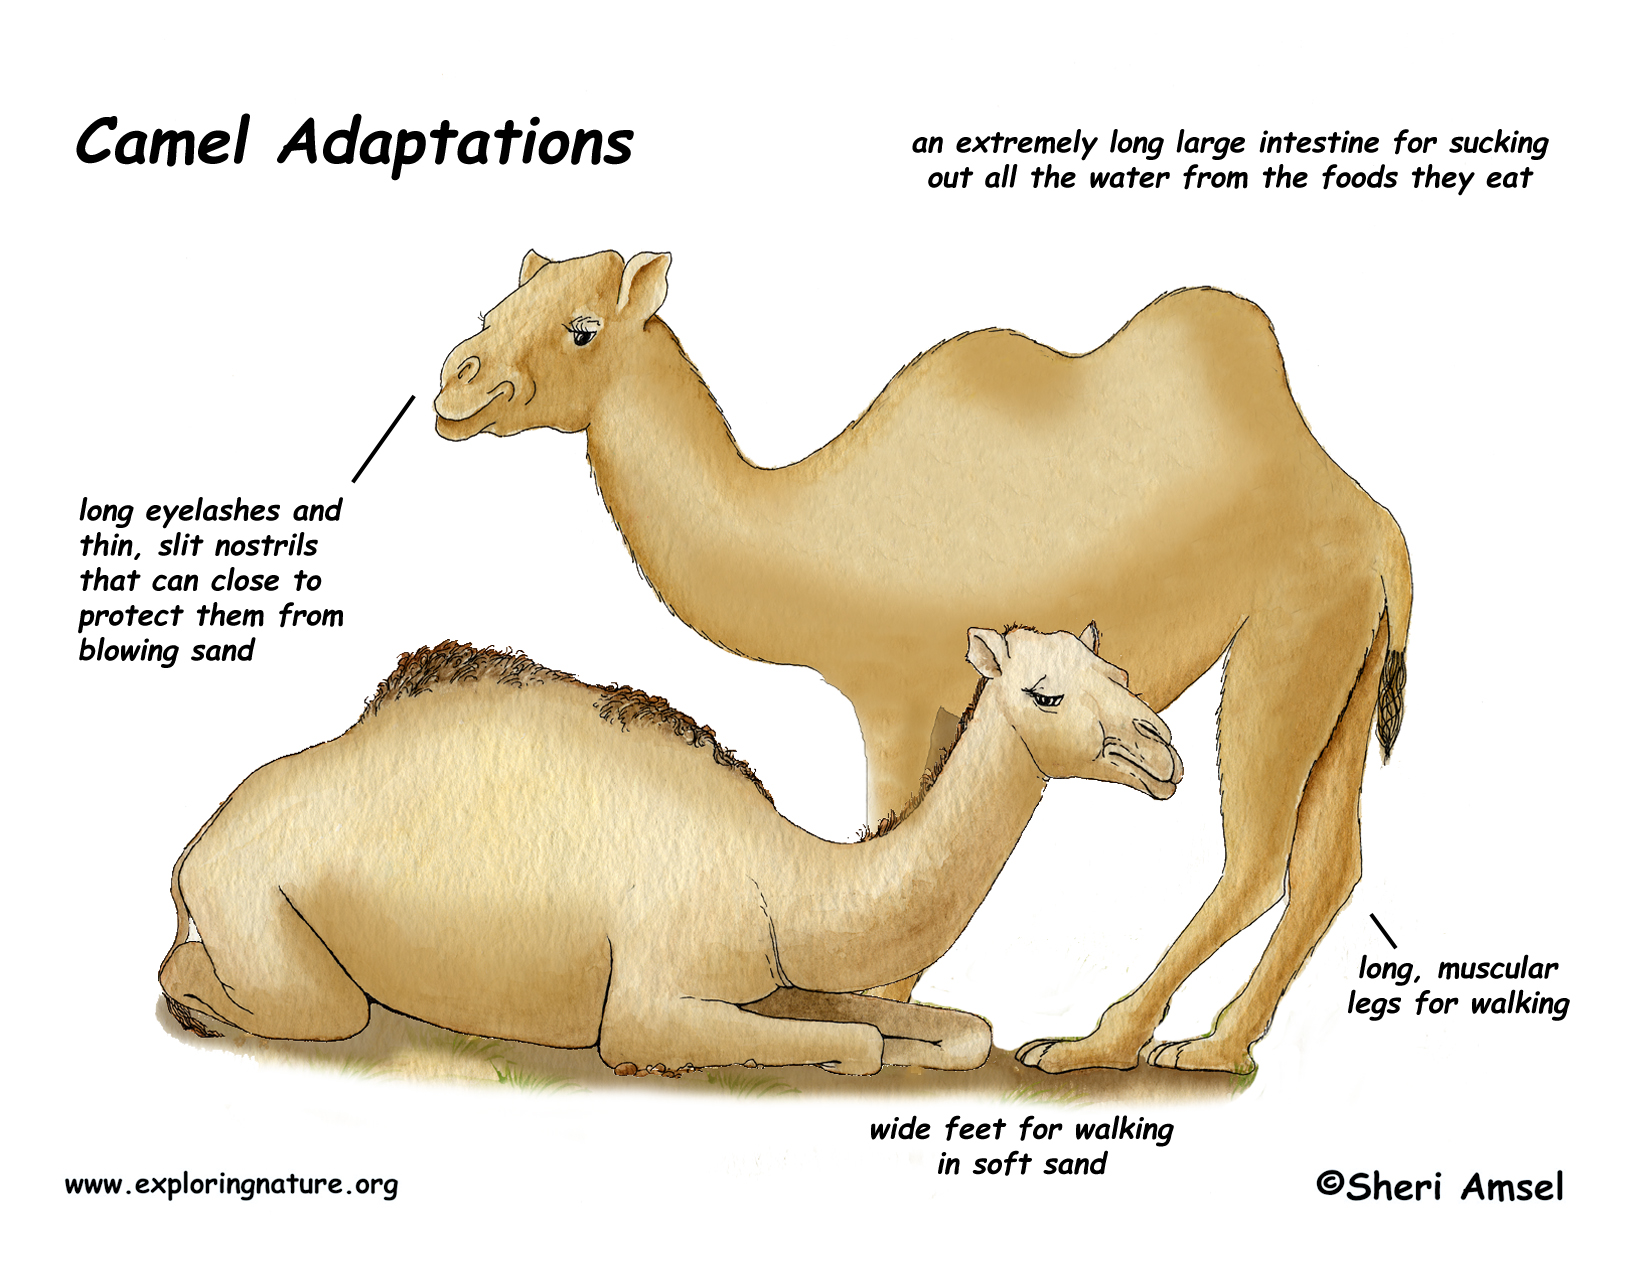 (http://www.exploringnature.org/graphics/in_habitat/adapation_camel.jpg)